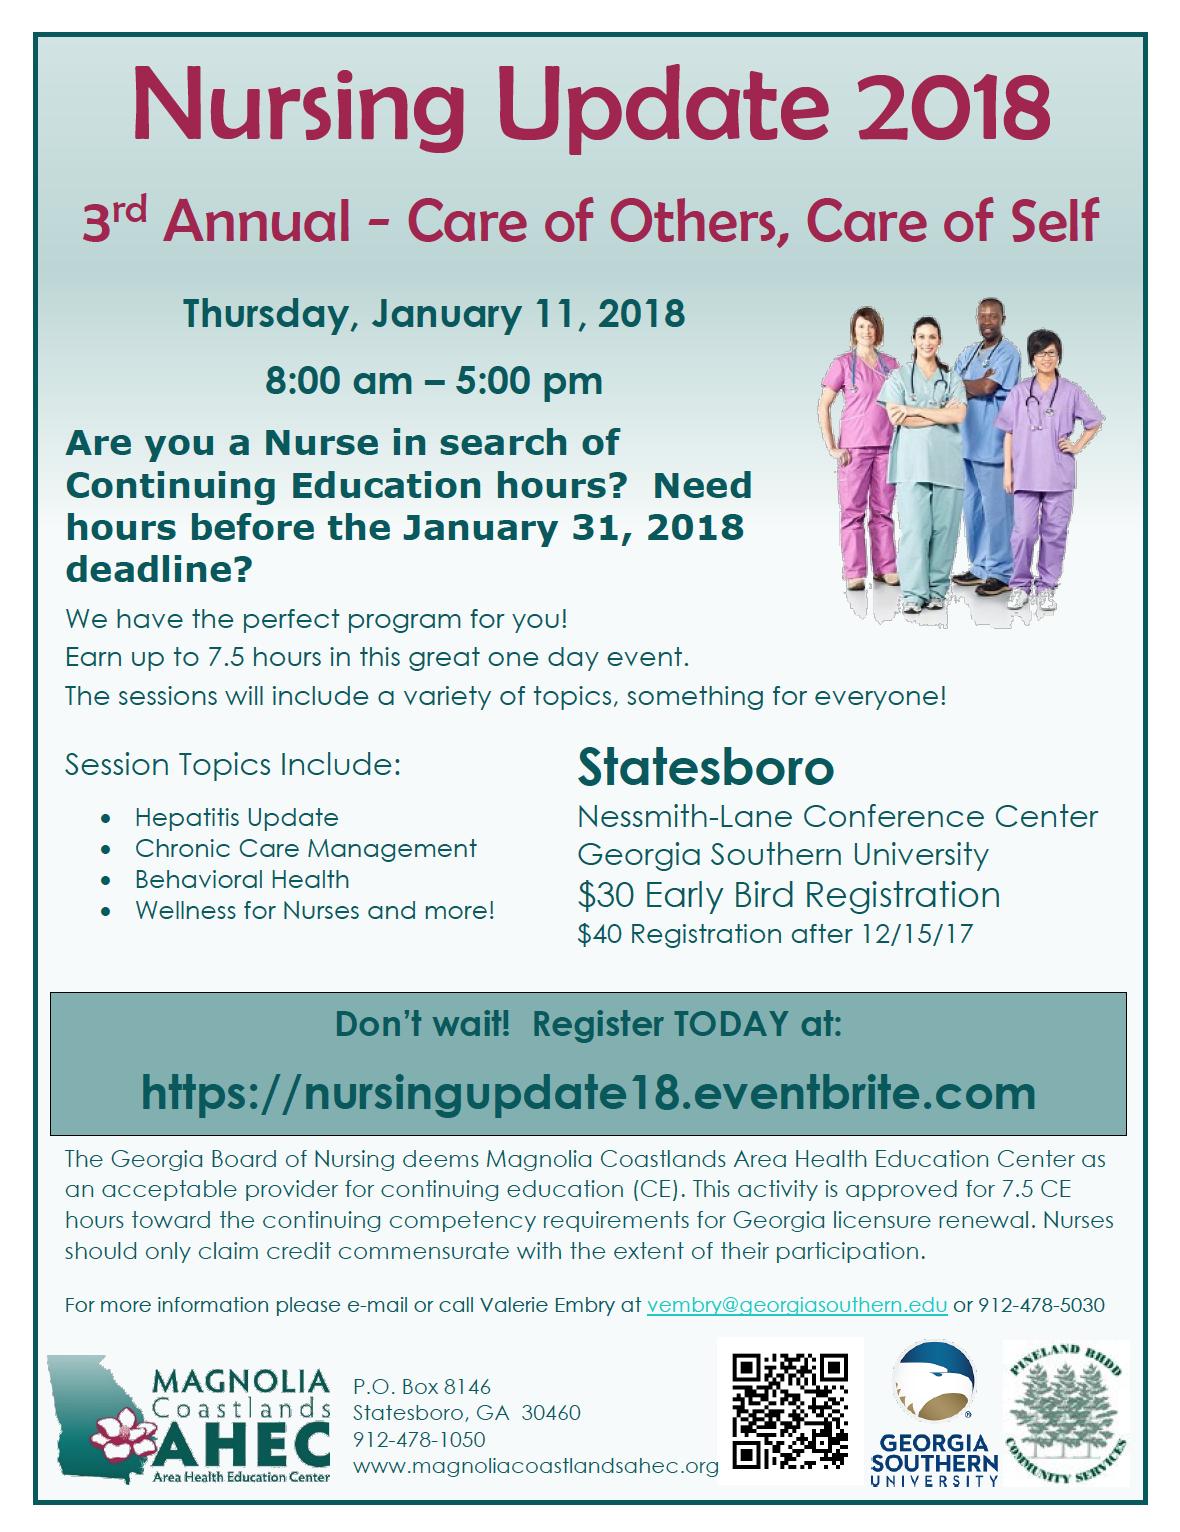 Nursing Update 2018